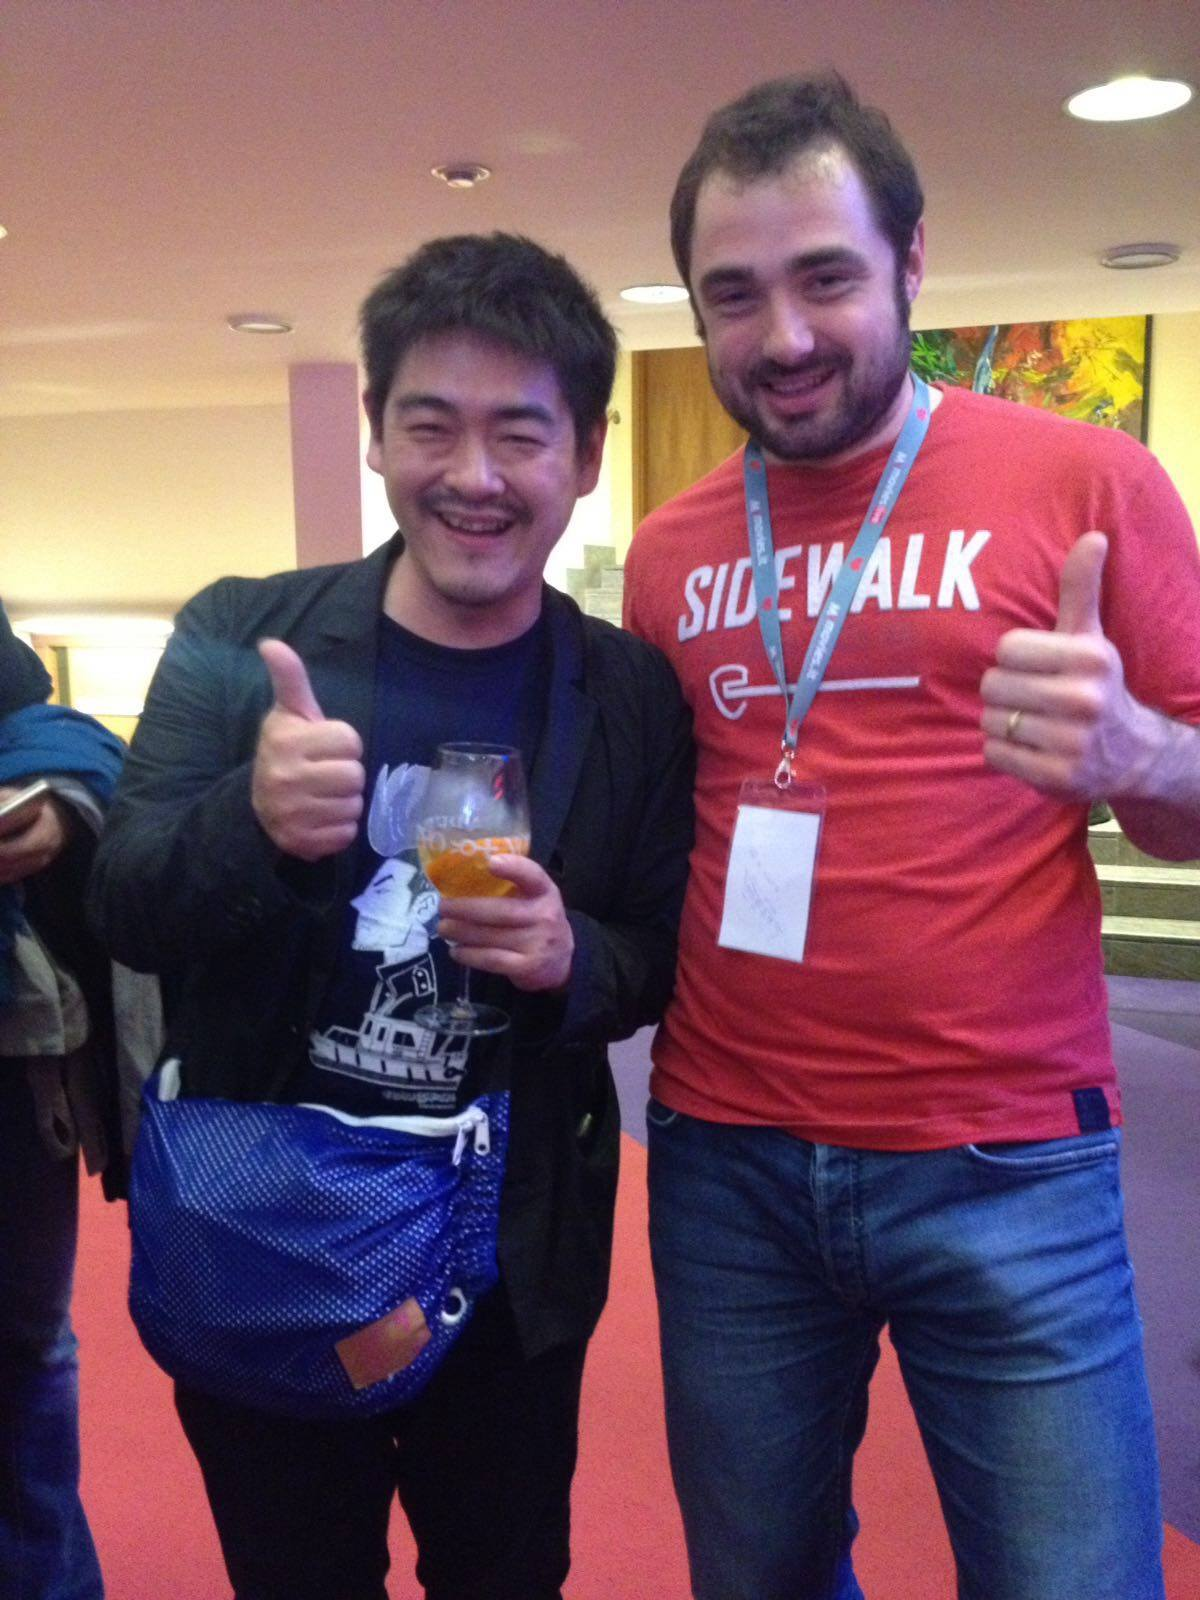 Suichi Okita e Martino Savorani, Far East Film Festival, Udine 2016